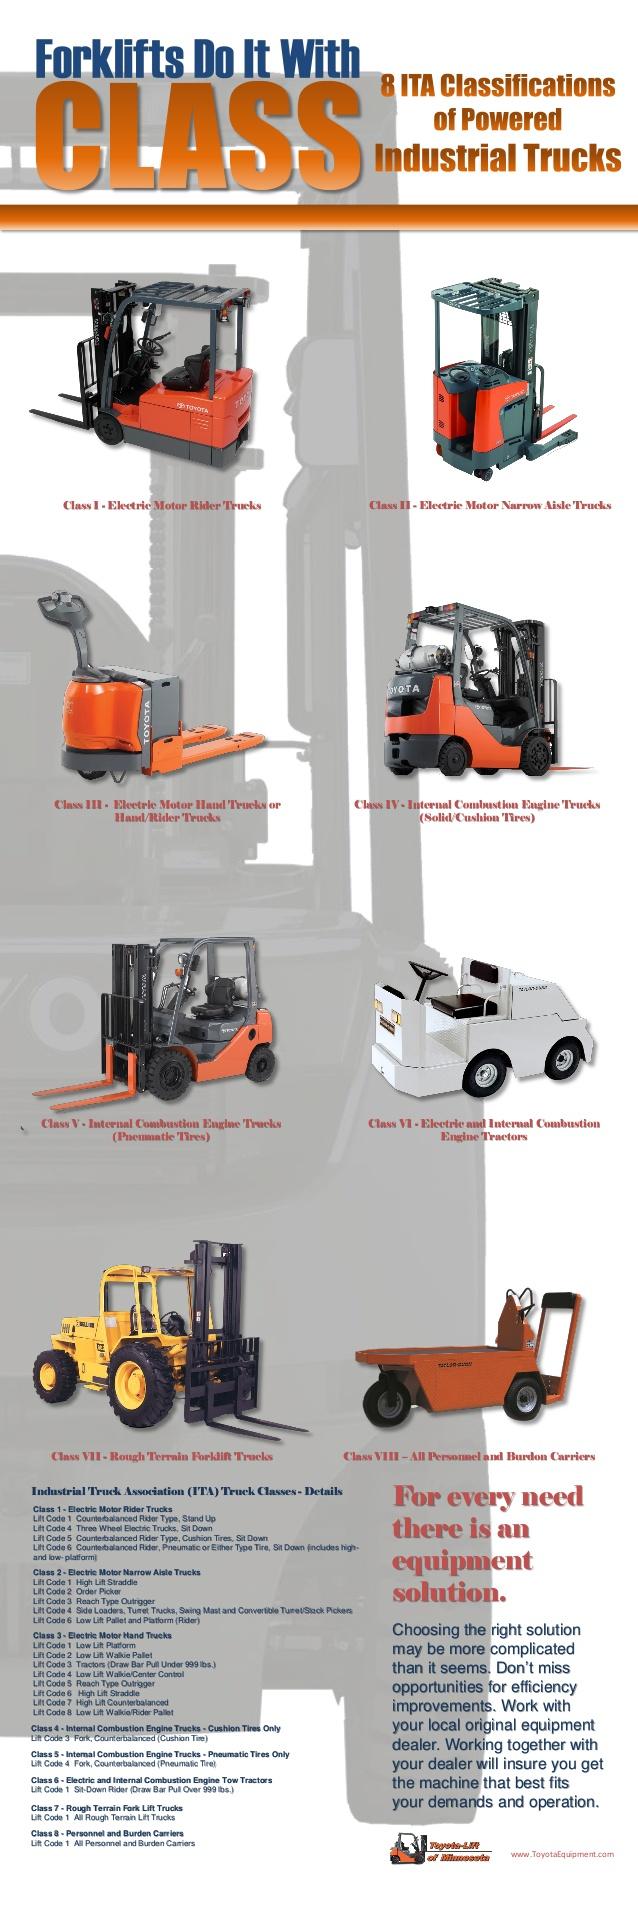 Forklift Ita Equipment Classifications Material Handling N More